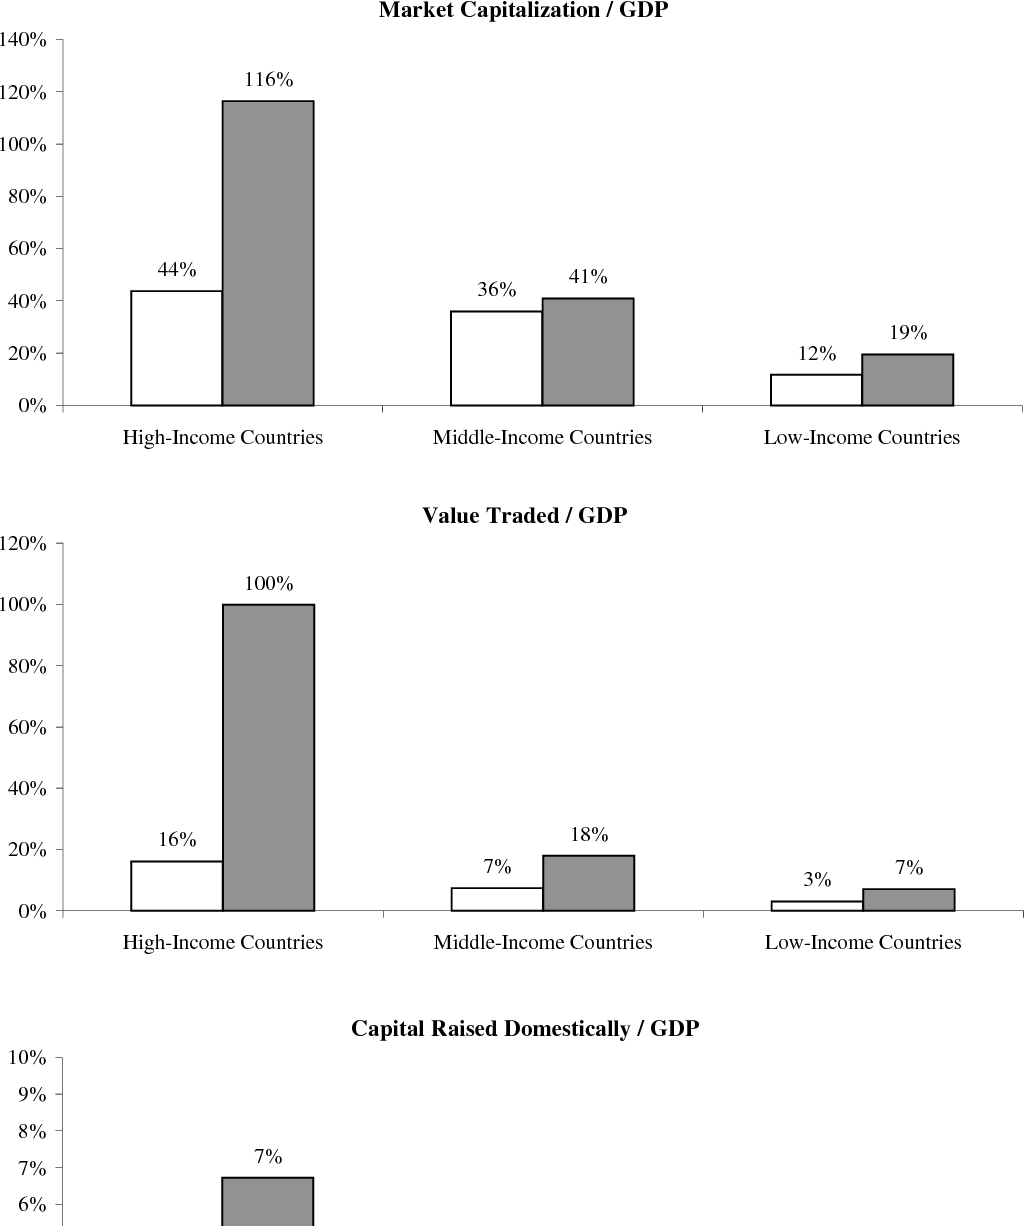 Stock market development and internationalization: Do economic